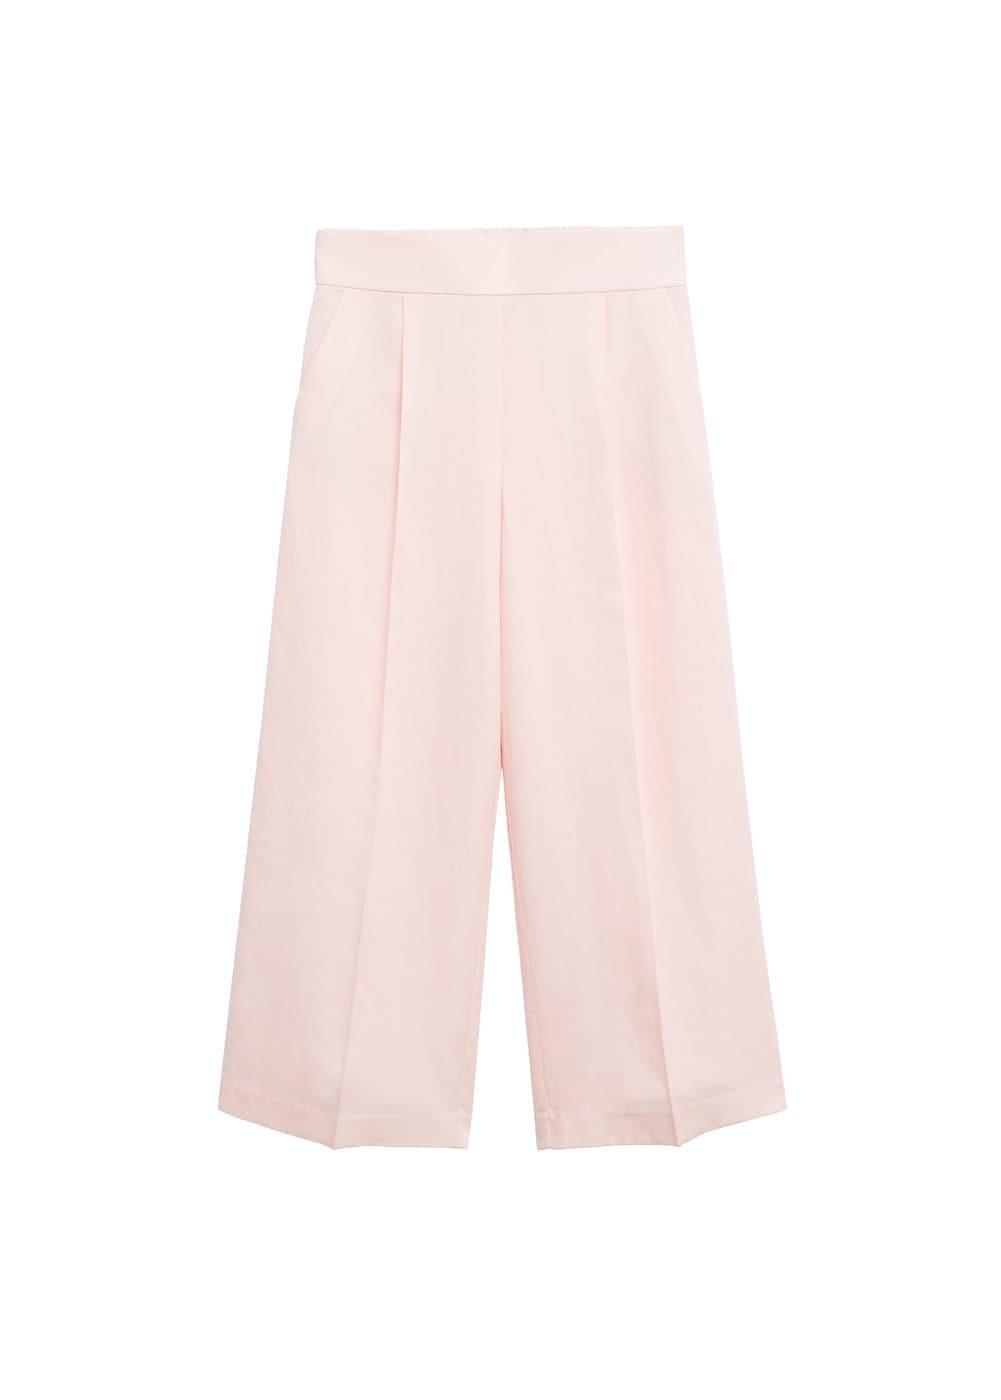 Pantalones cropped rosa de Mango